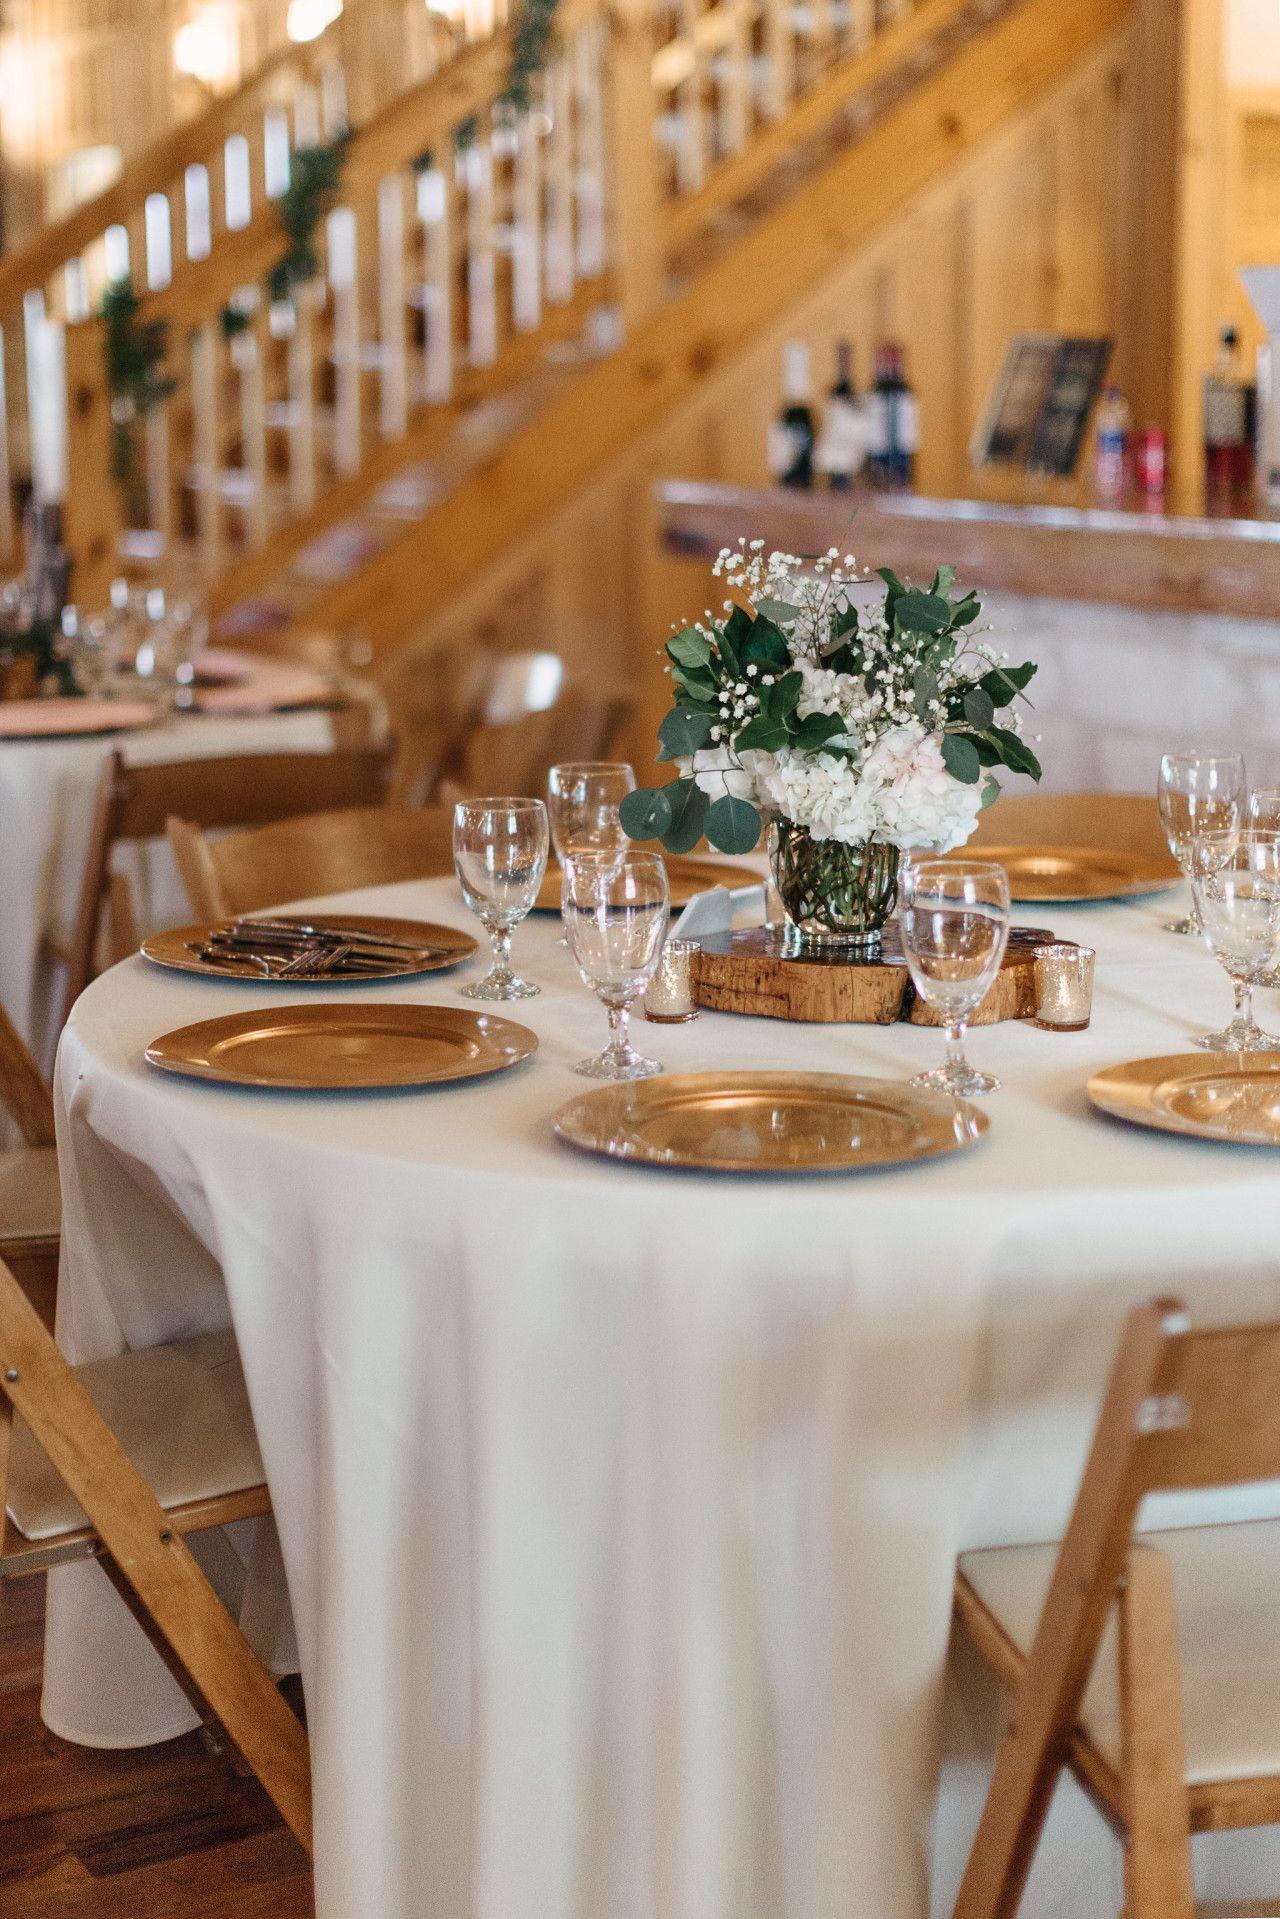 White wedding decor ideas  white  gold wedding table centerpiece  modern rustic wedding table